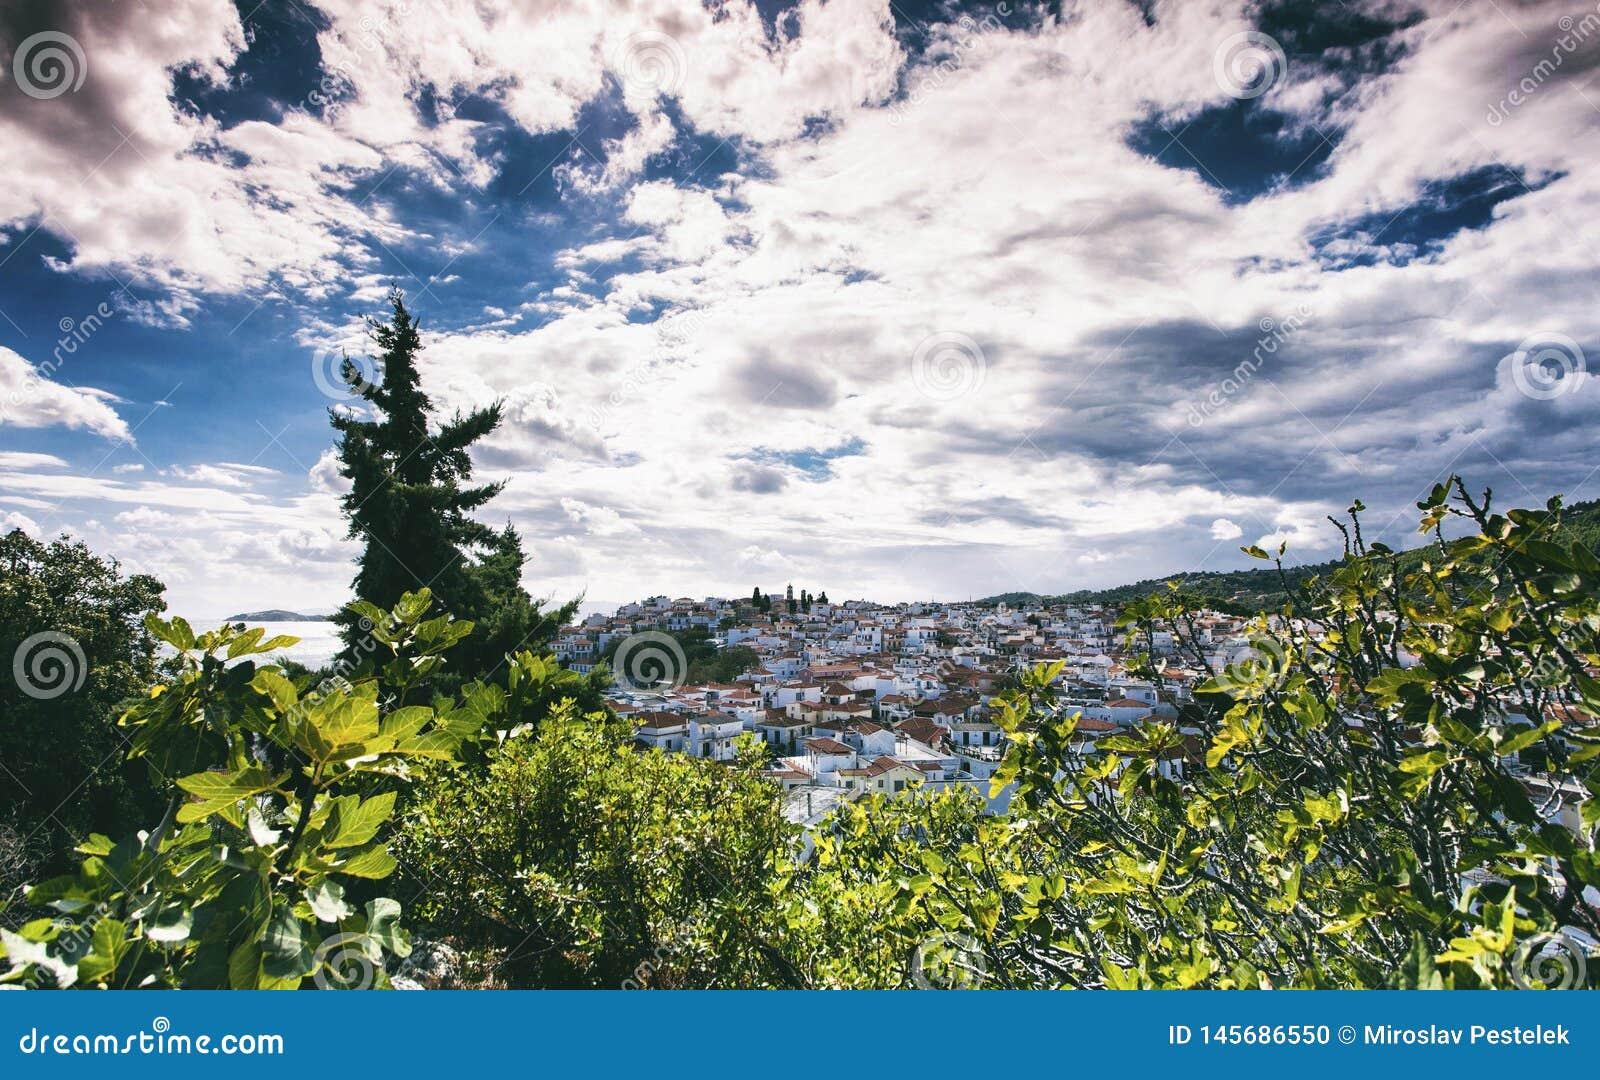 Skiathos town in Greece